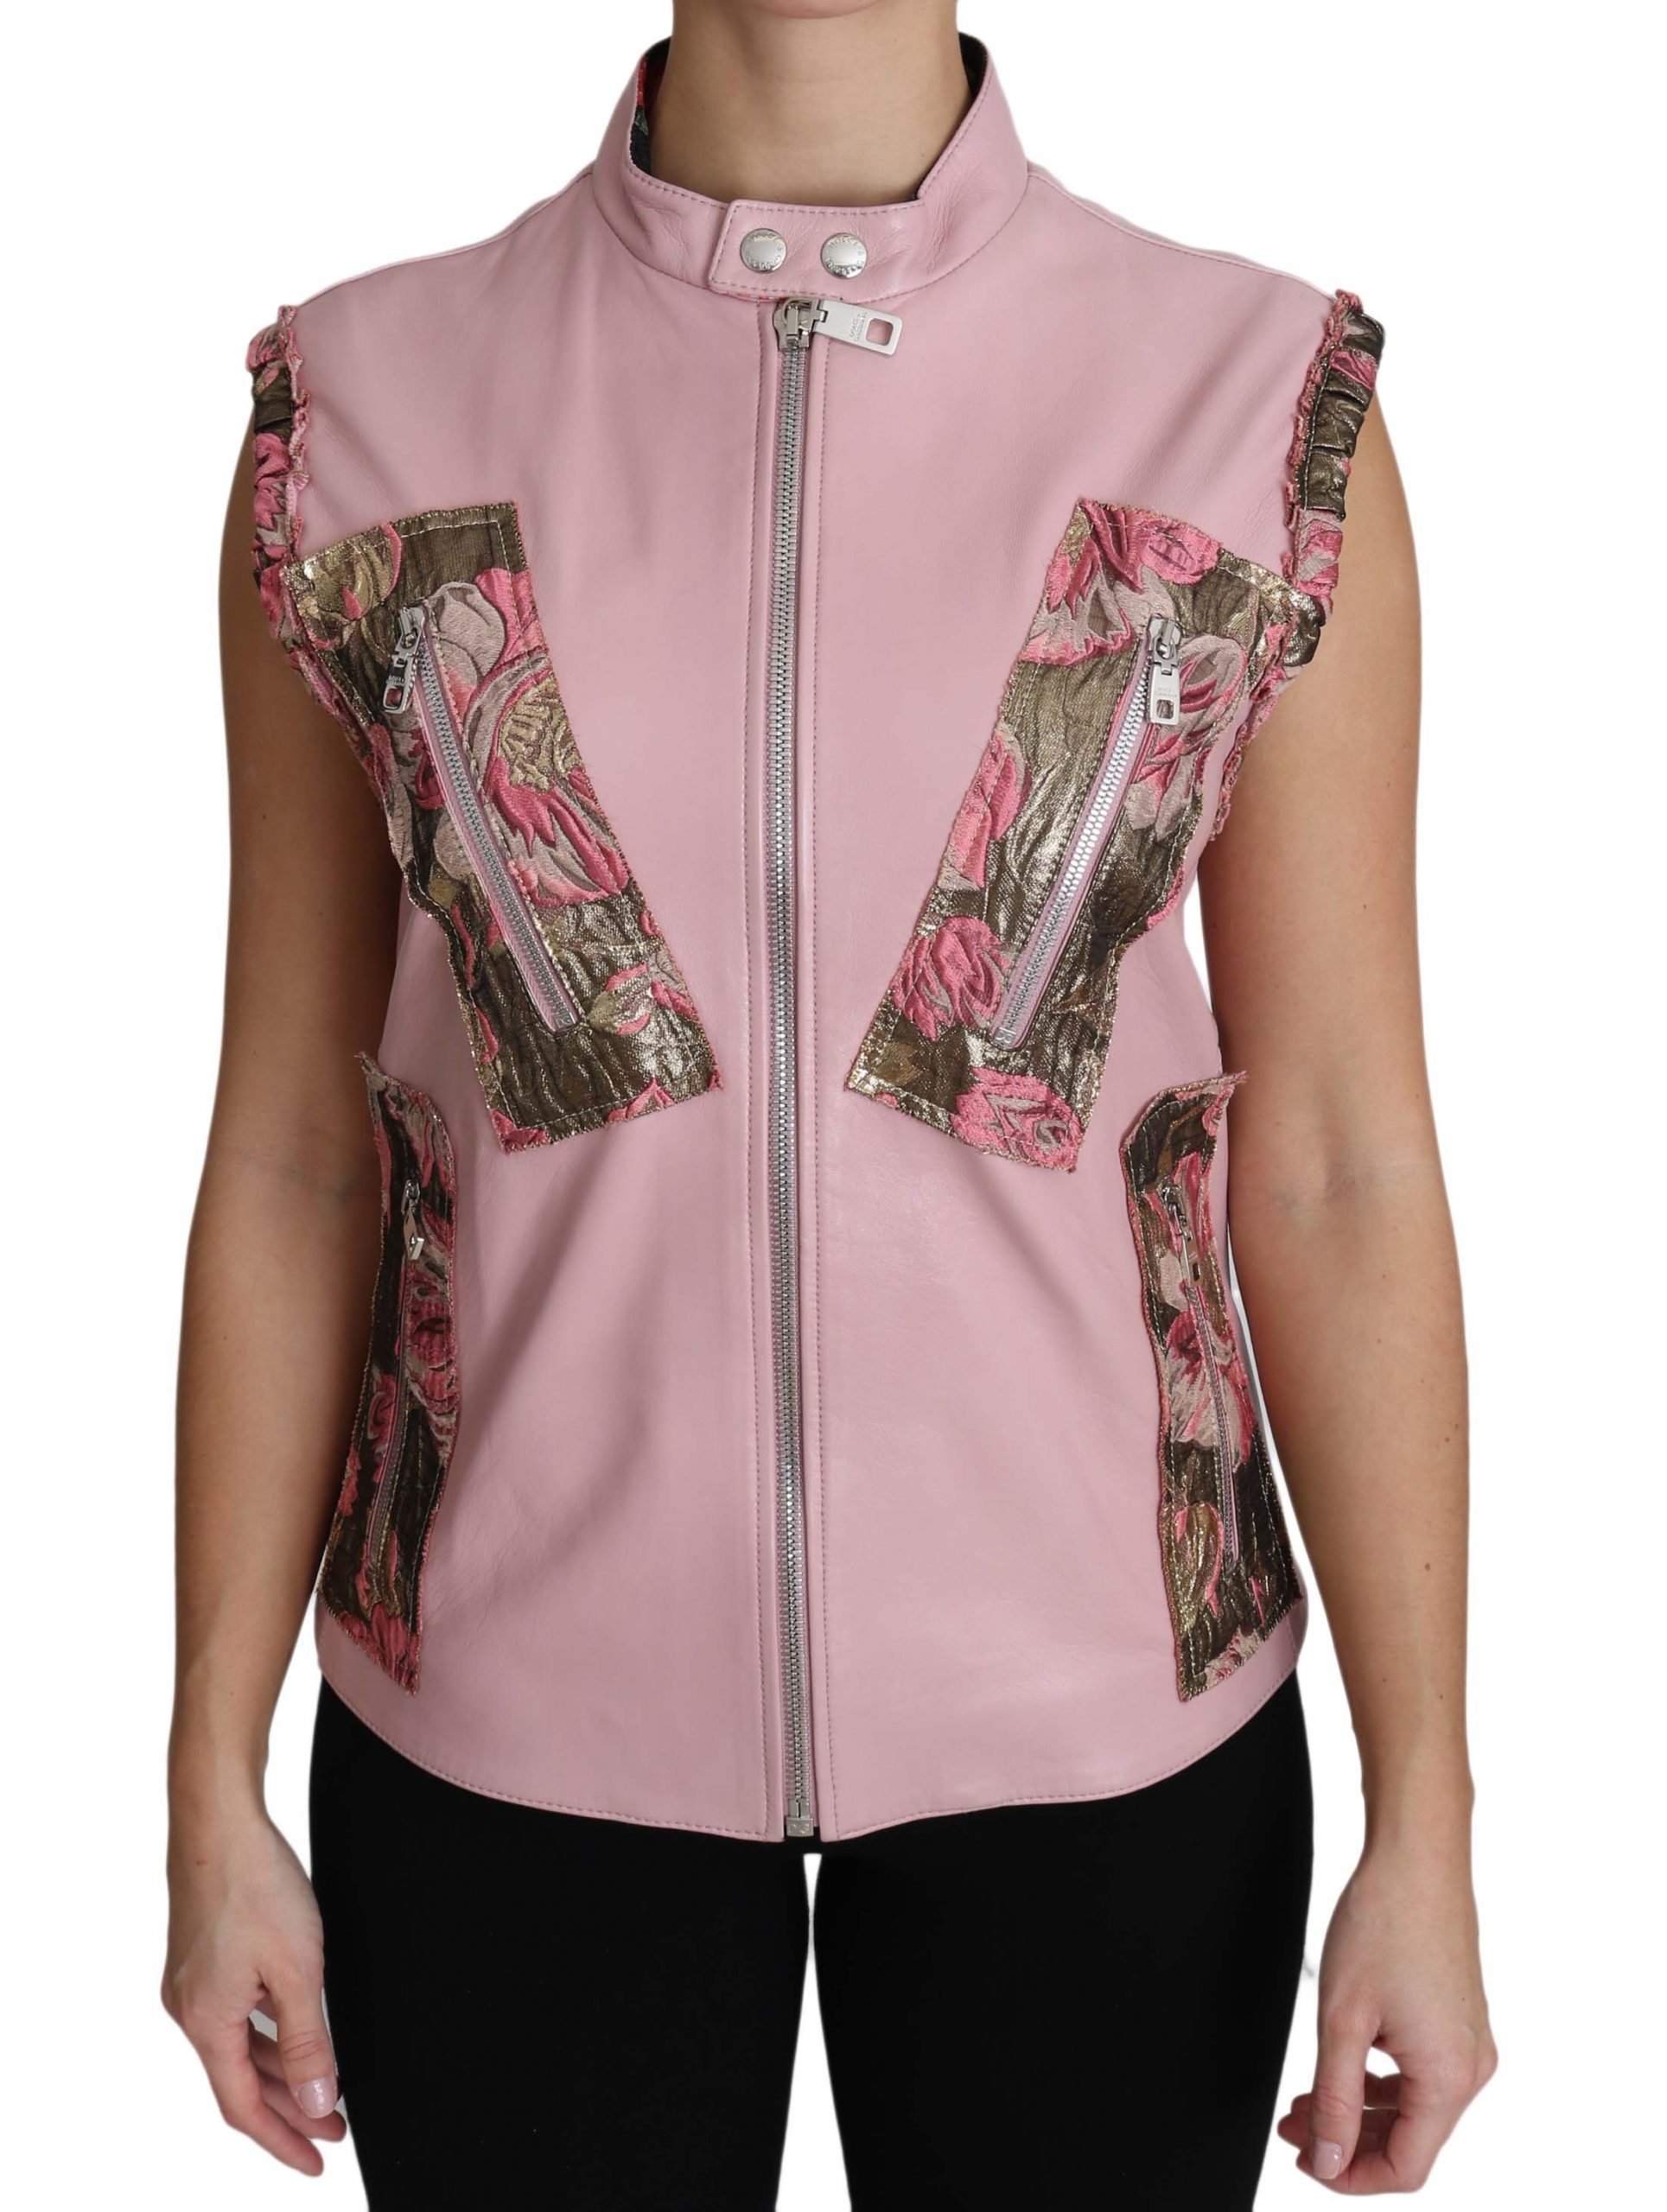 Dolce & Gabbana Women's Zippered Lamb Sleeveless Vest Leather Jacket Pink TSH3200 - IT40|S